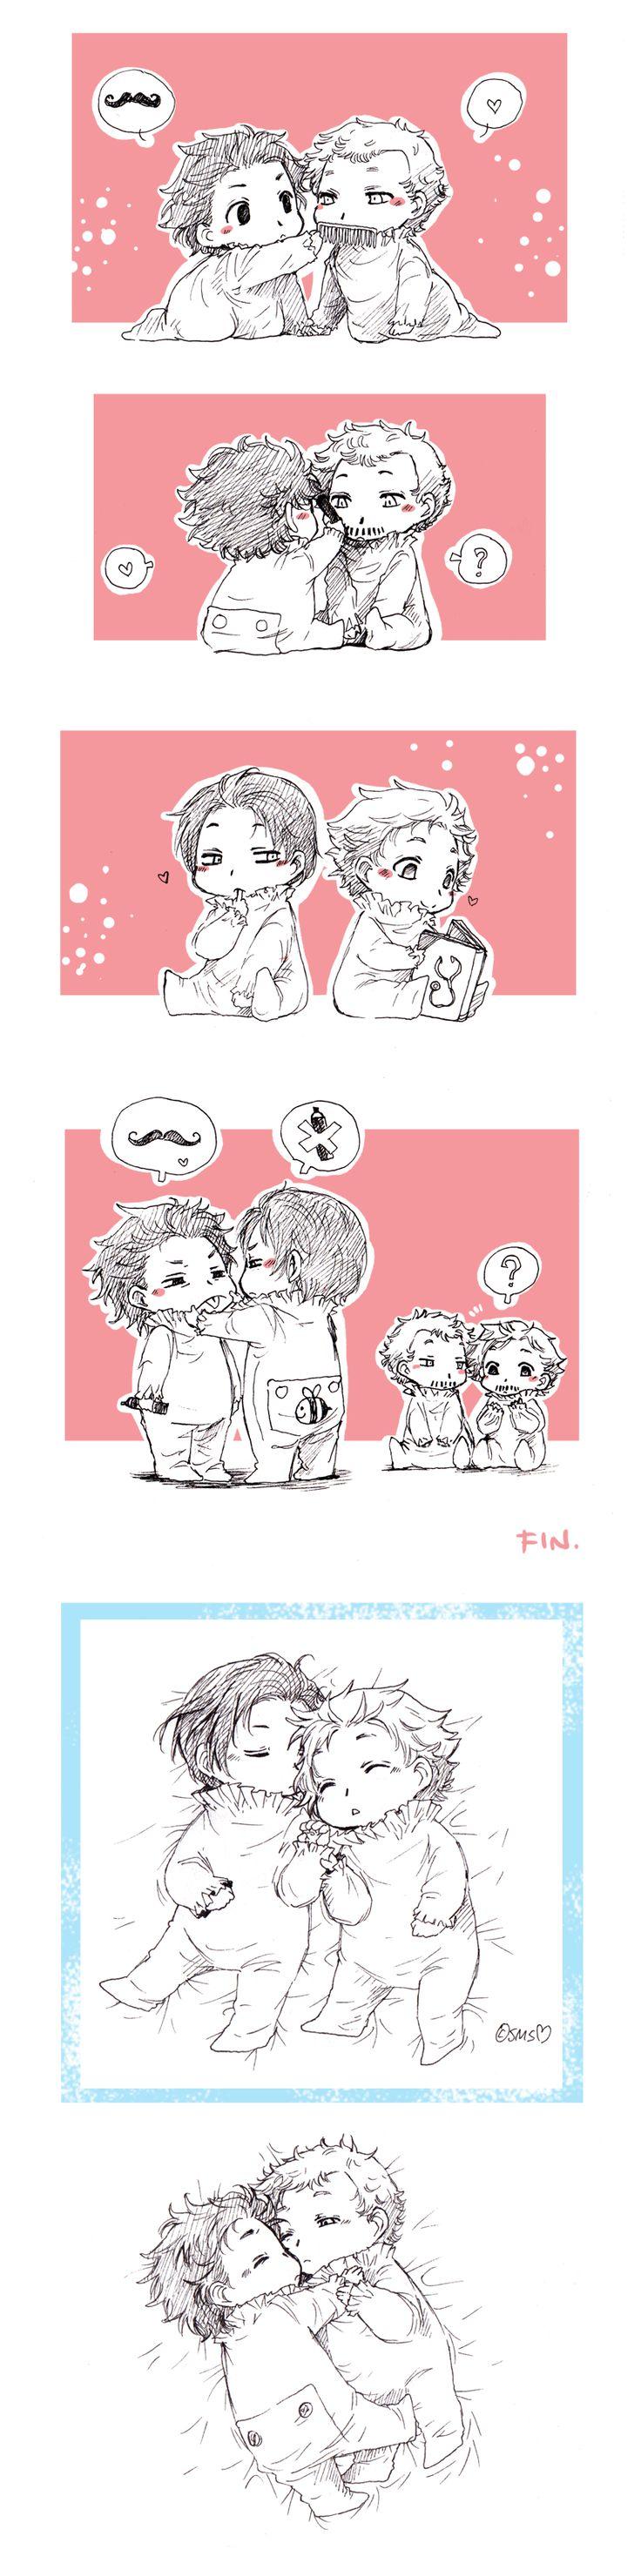 SH - Babies LOL by Sadyna.deviantart.com on @deviantART